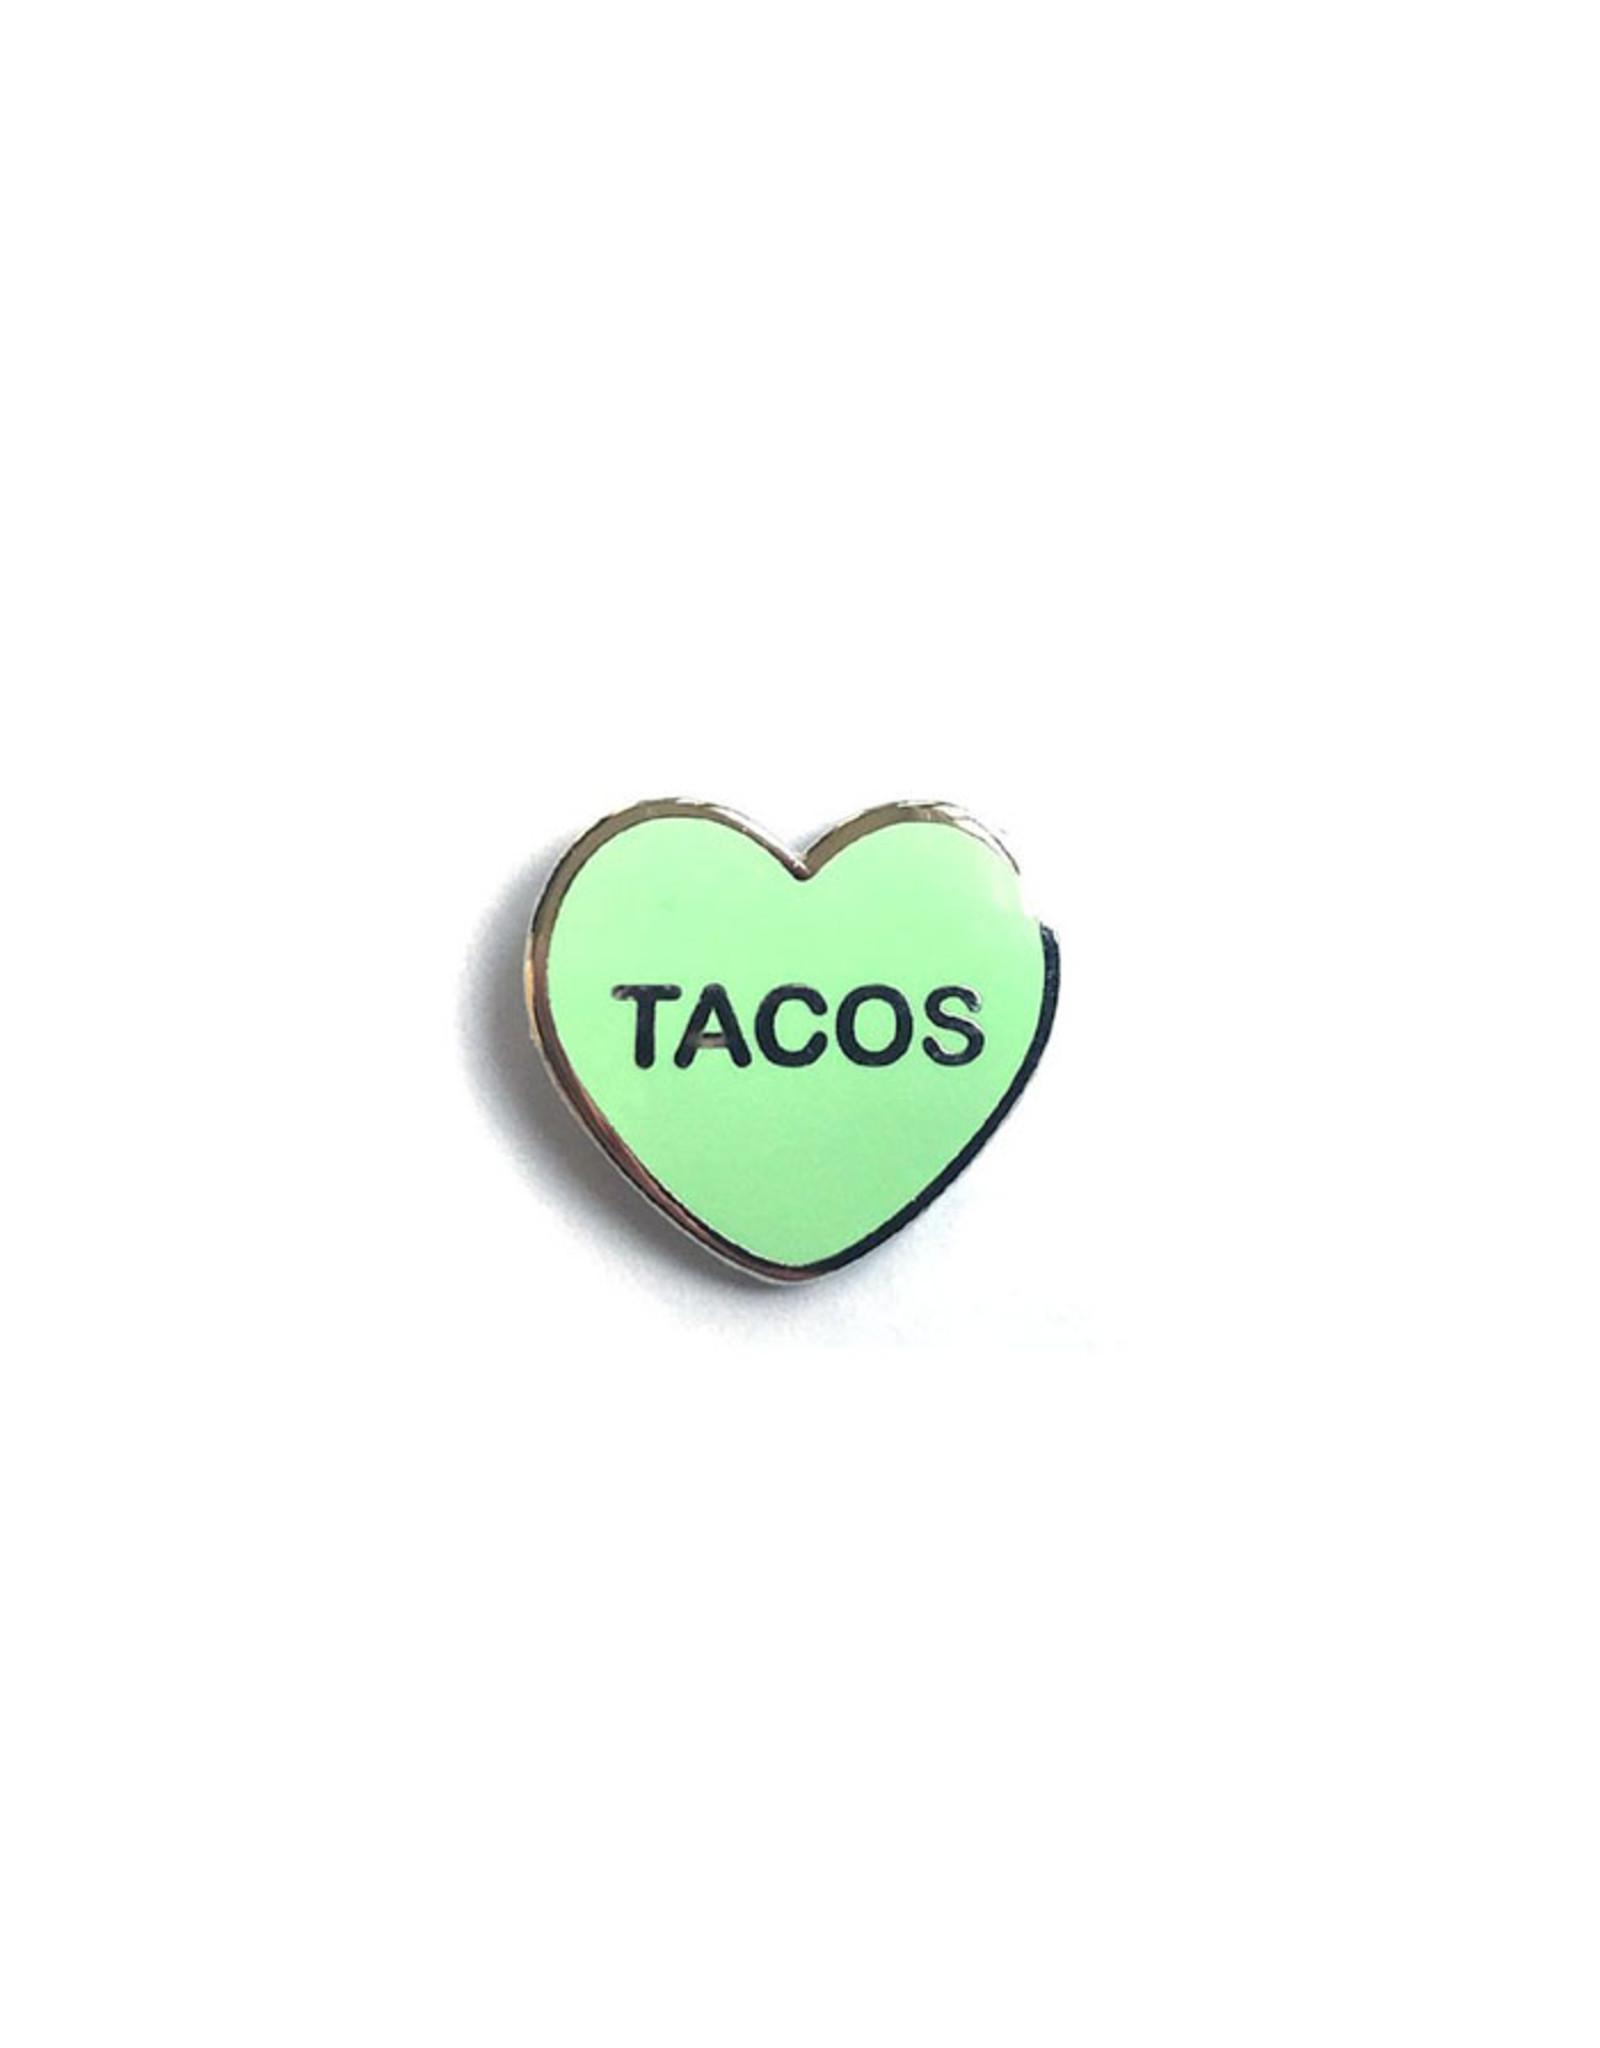 Enamel Pin Tacos Candy Heart Enamel Pin